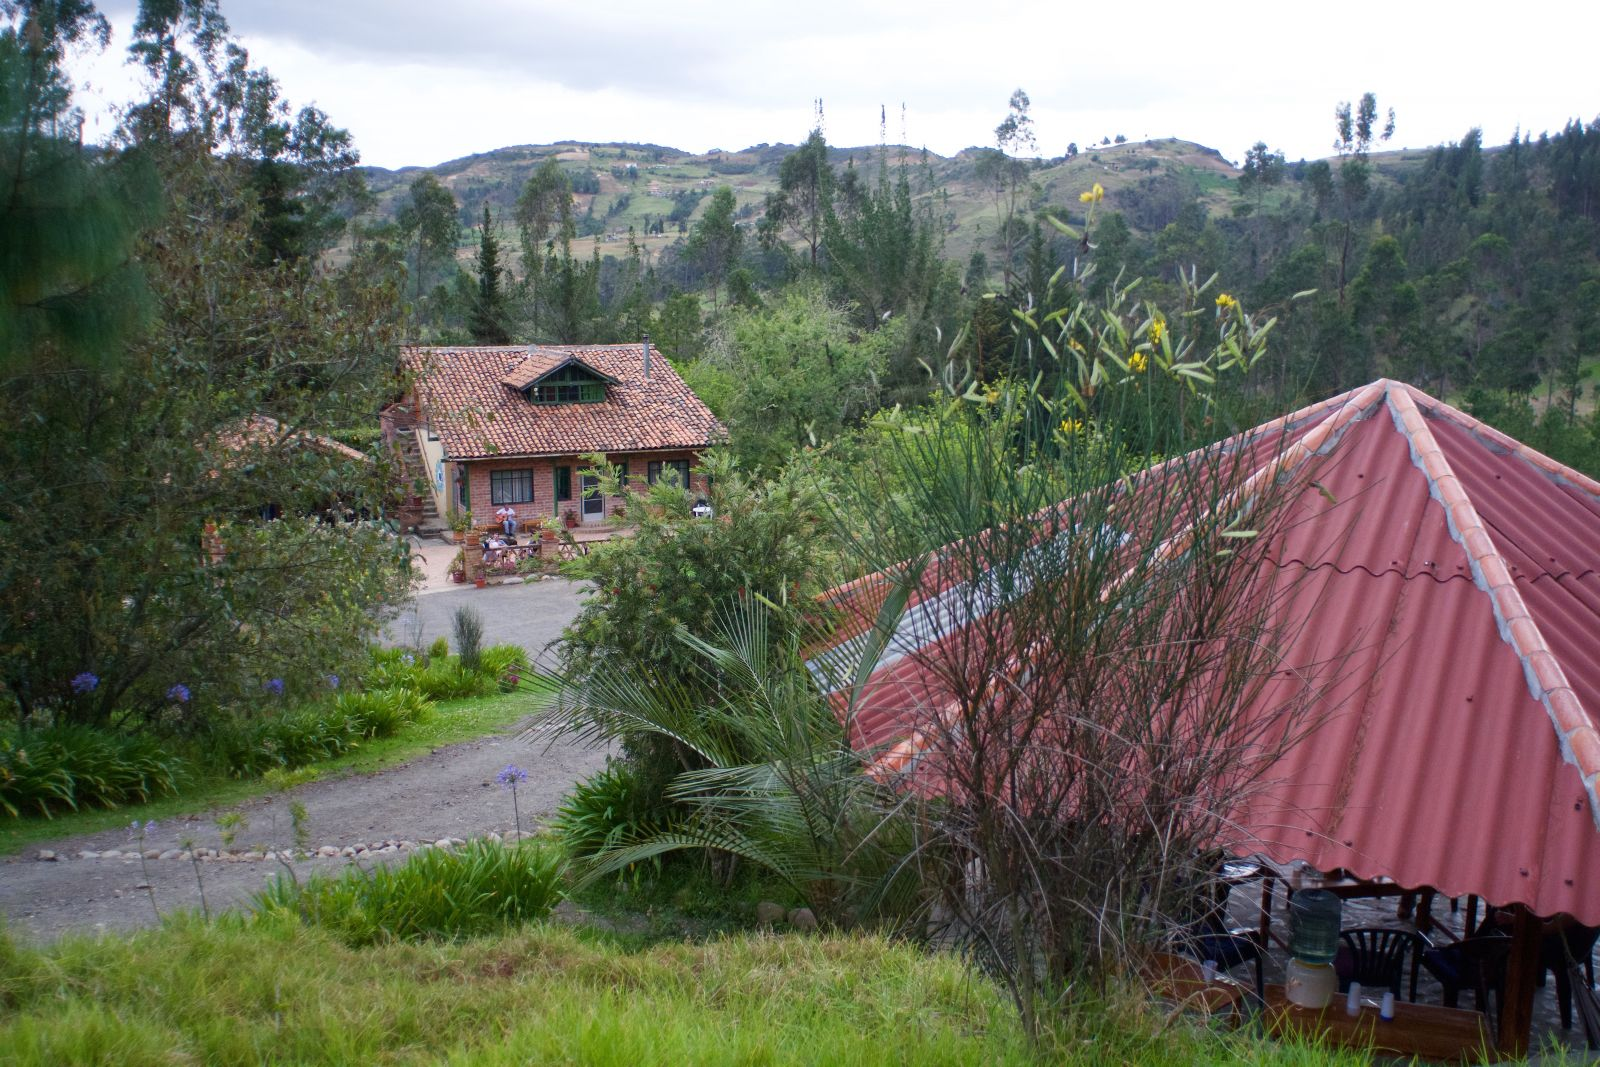 gaia-sagrada-overview-ecuador